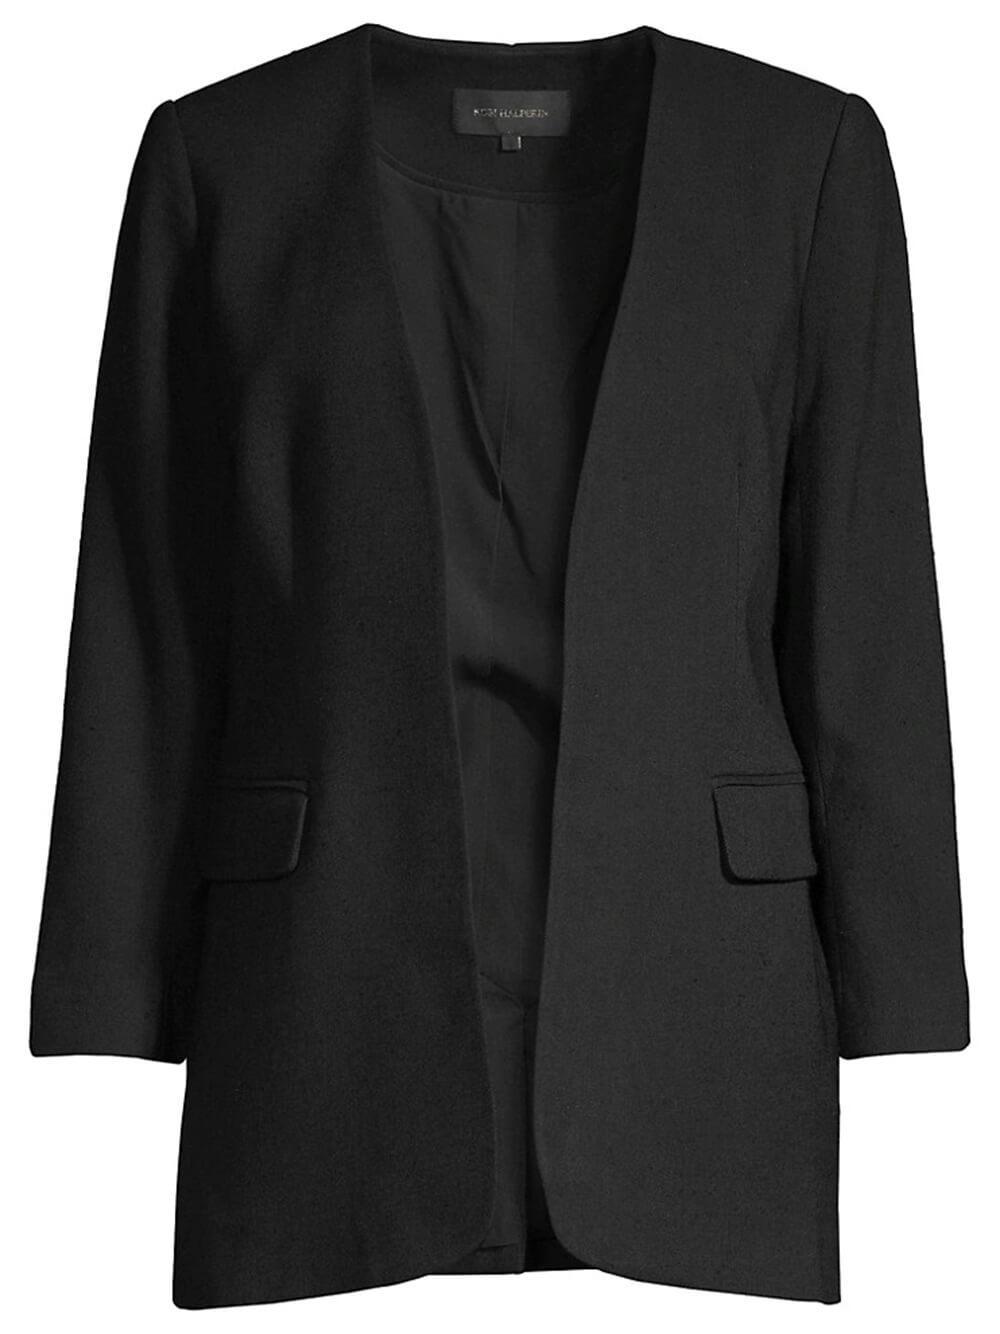 Eleanor Structured Jacket Item # KS1J03-1G